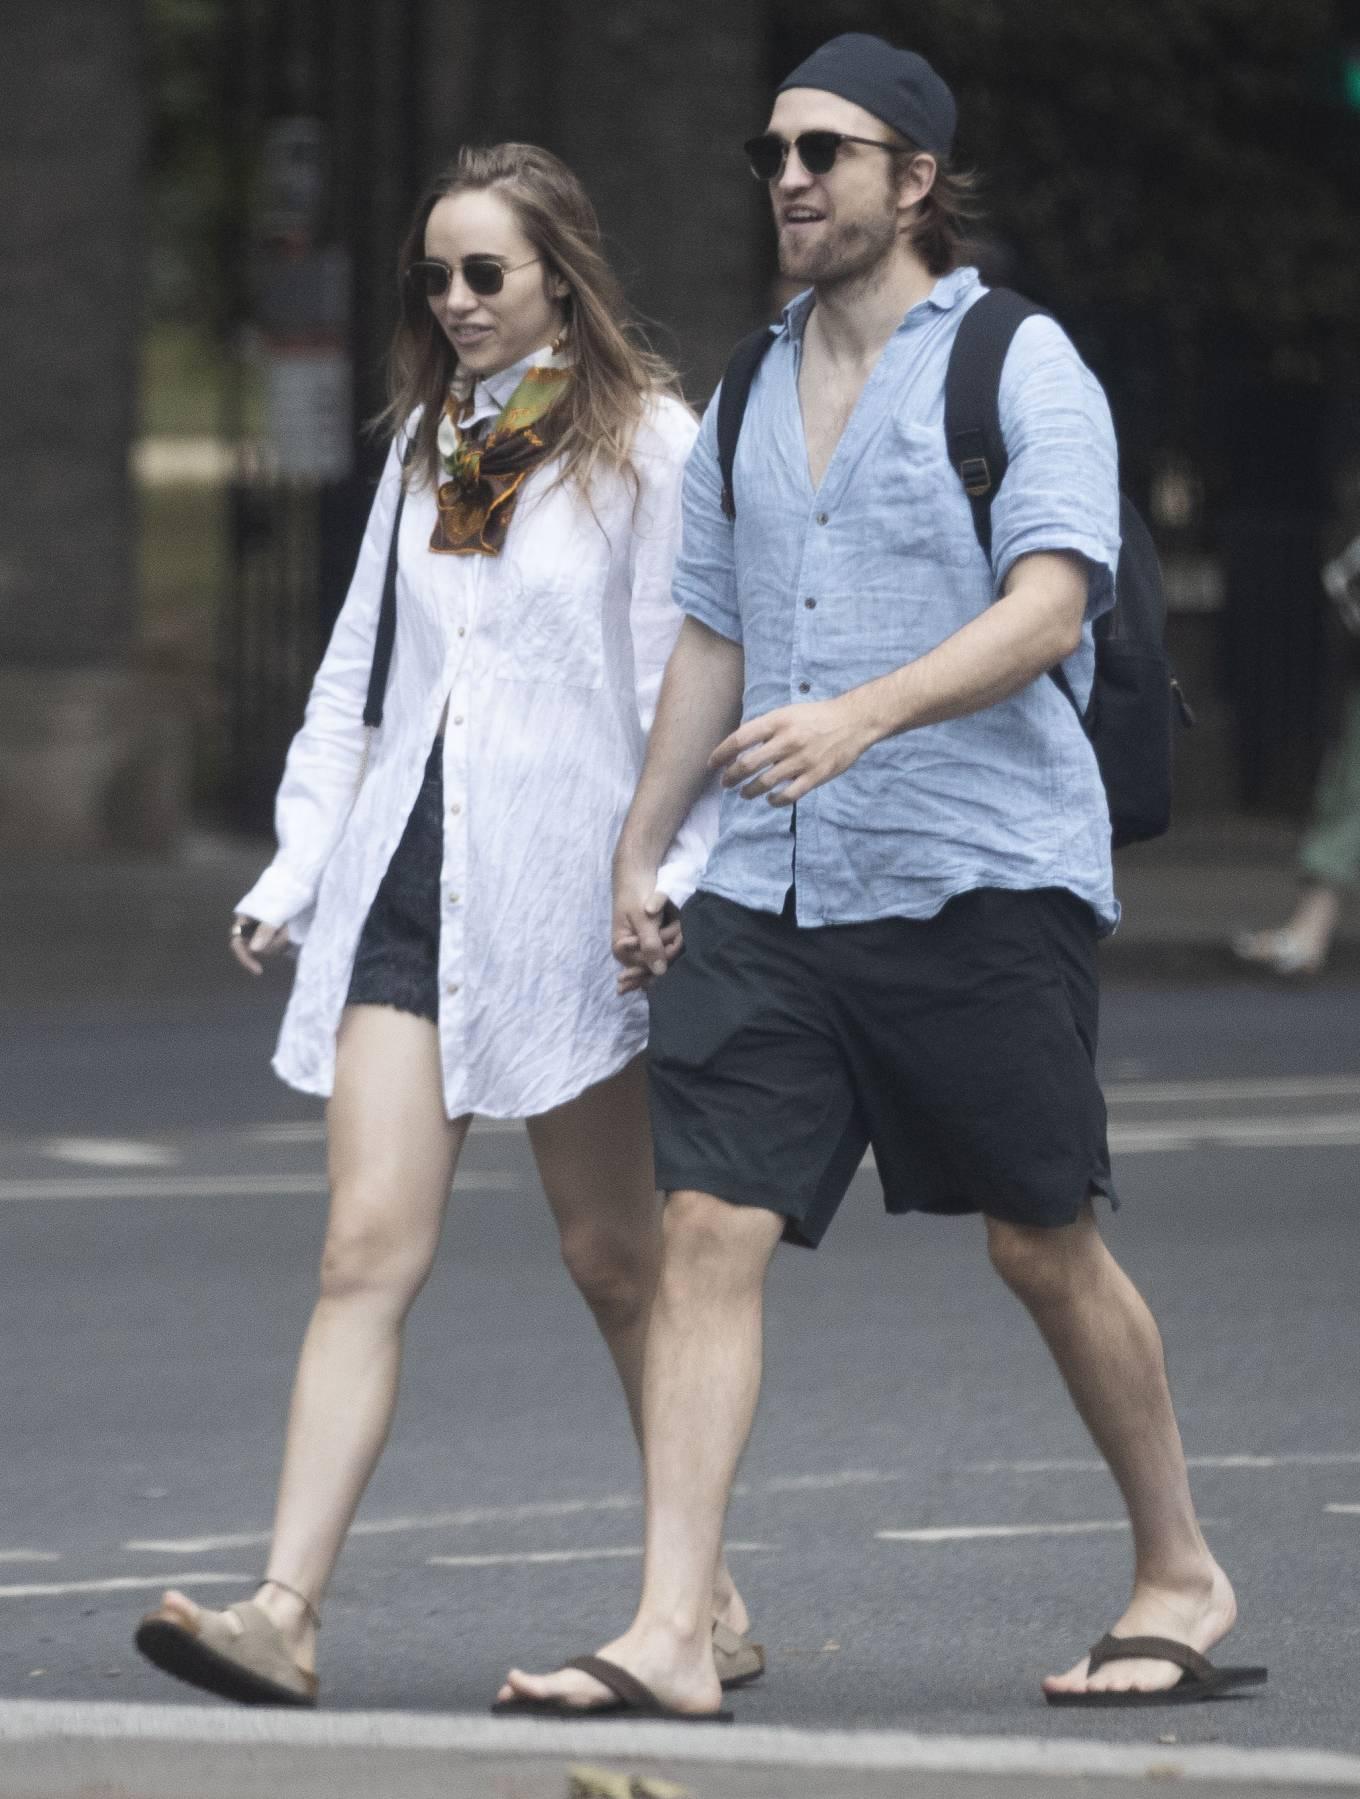 Suki Waterhouse and Robert Pattinson - Out in London